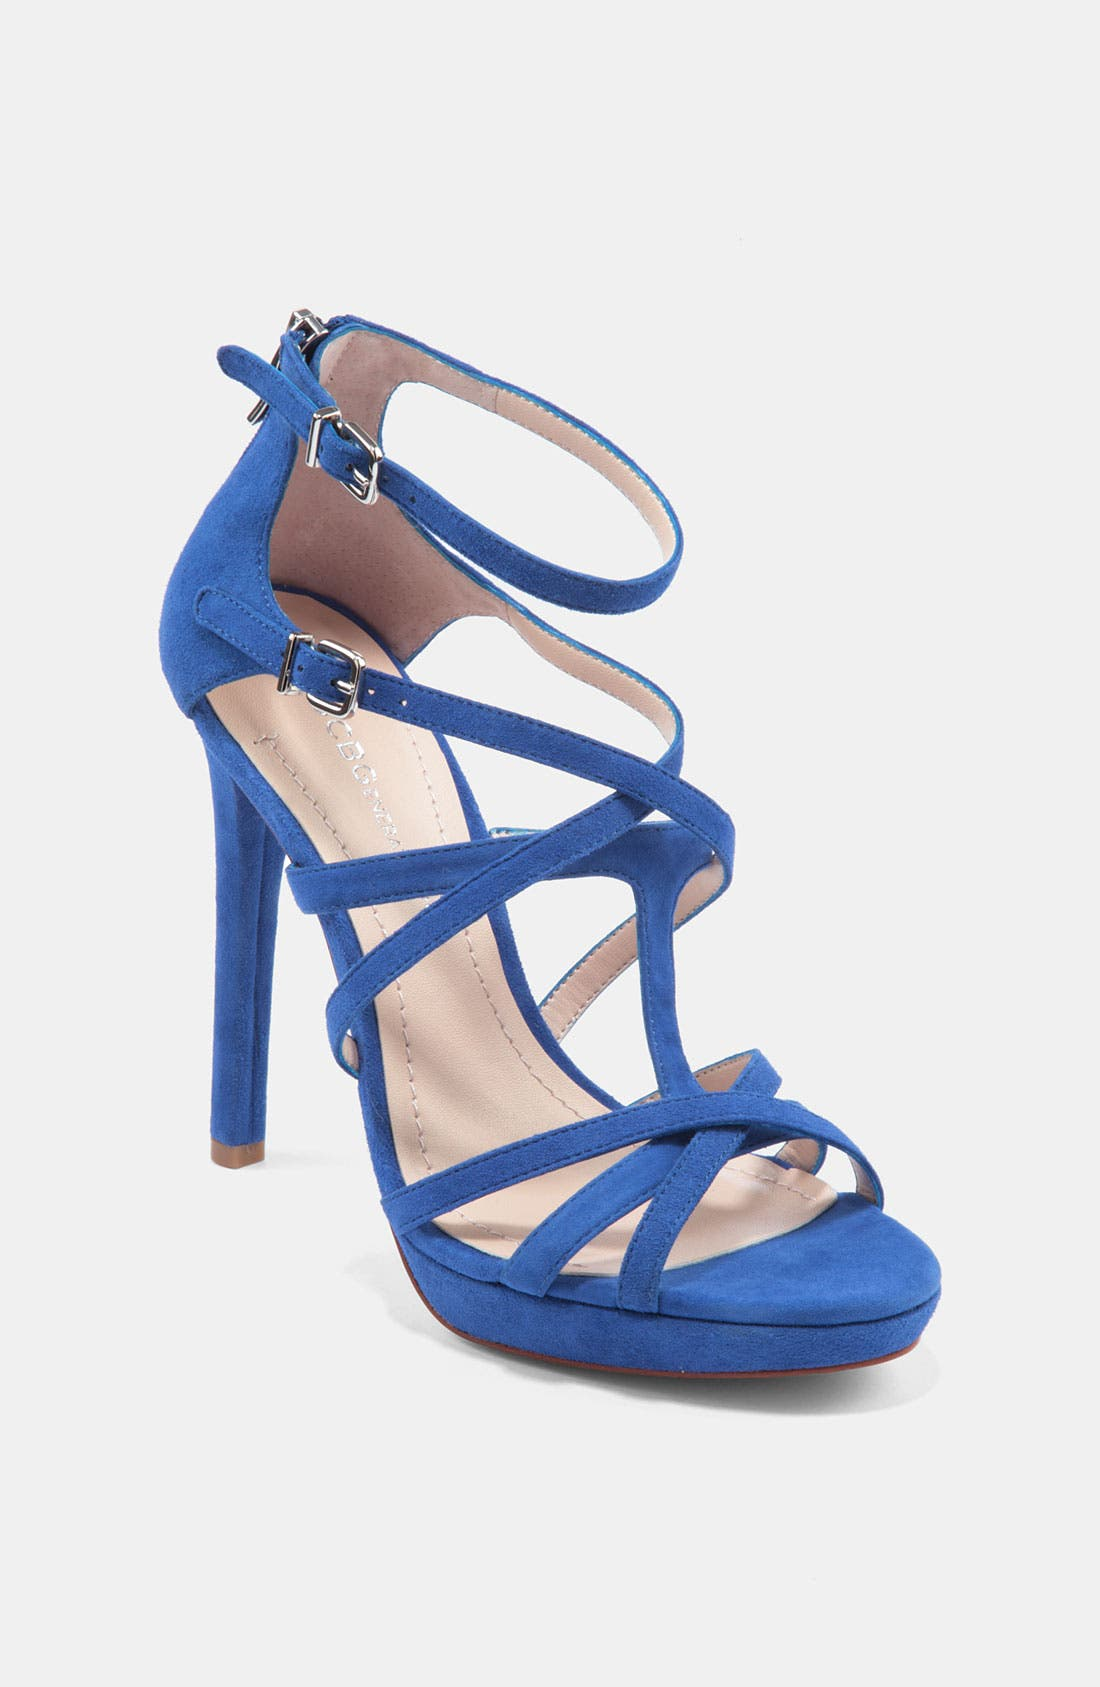 Main Image - BCBGeneration 'Montie' Sandal